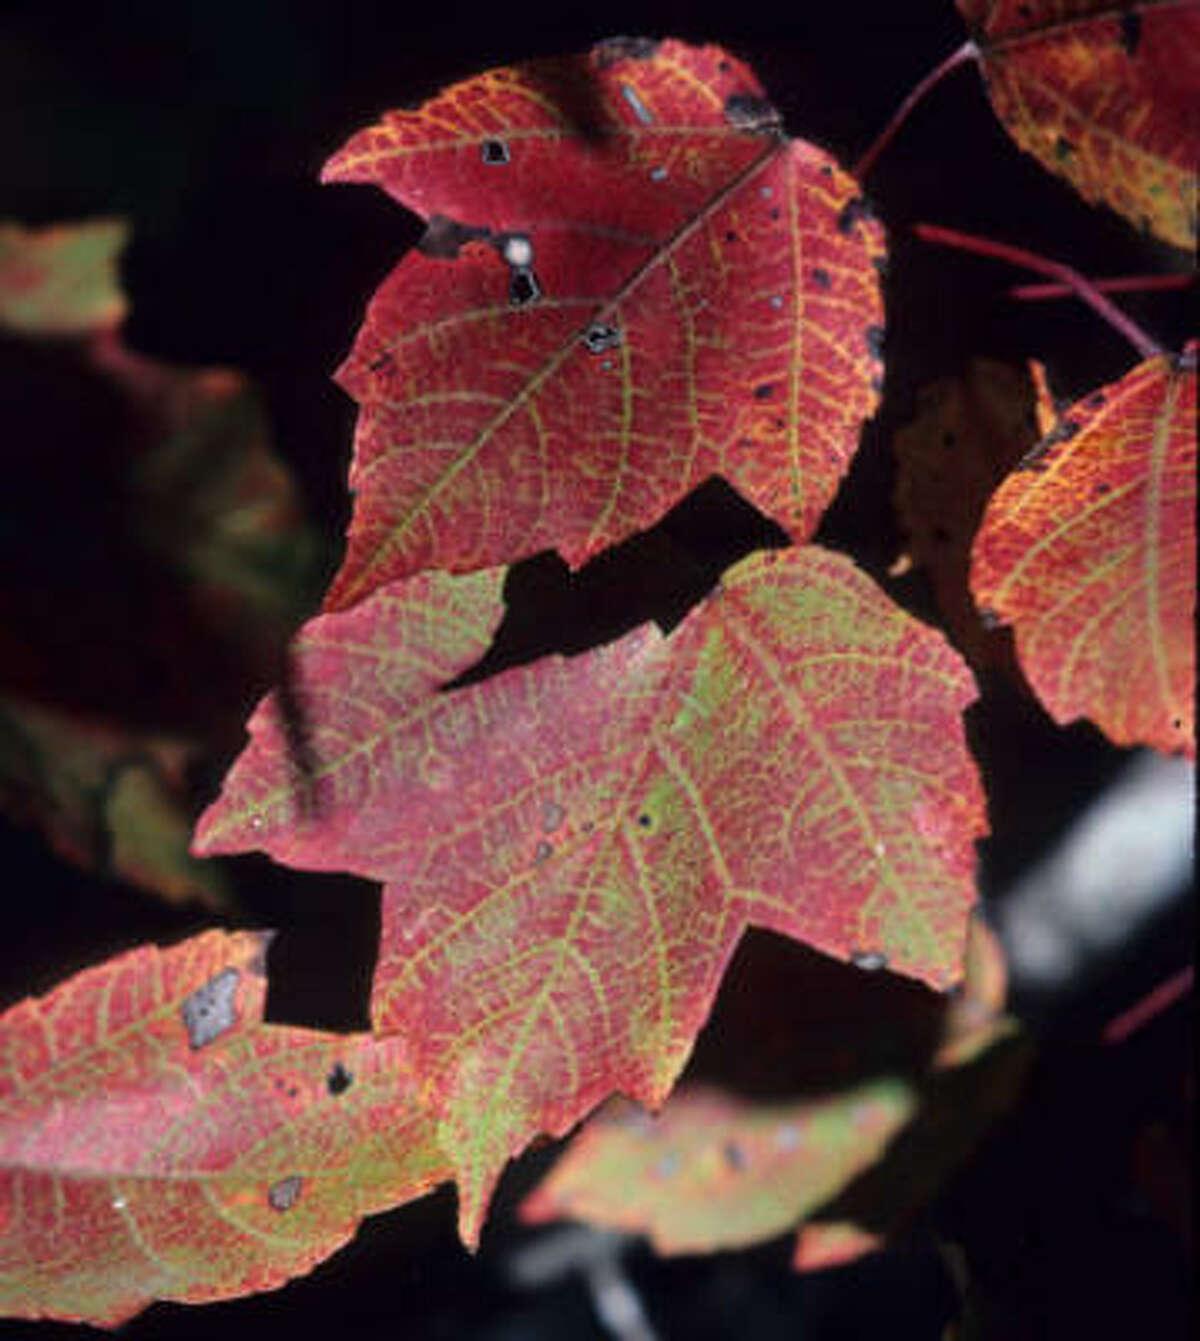 Drummond red maple (acer rubrum var. drummondii)